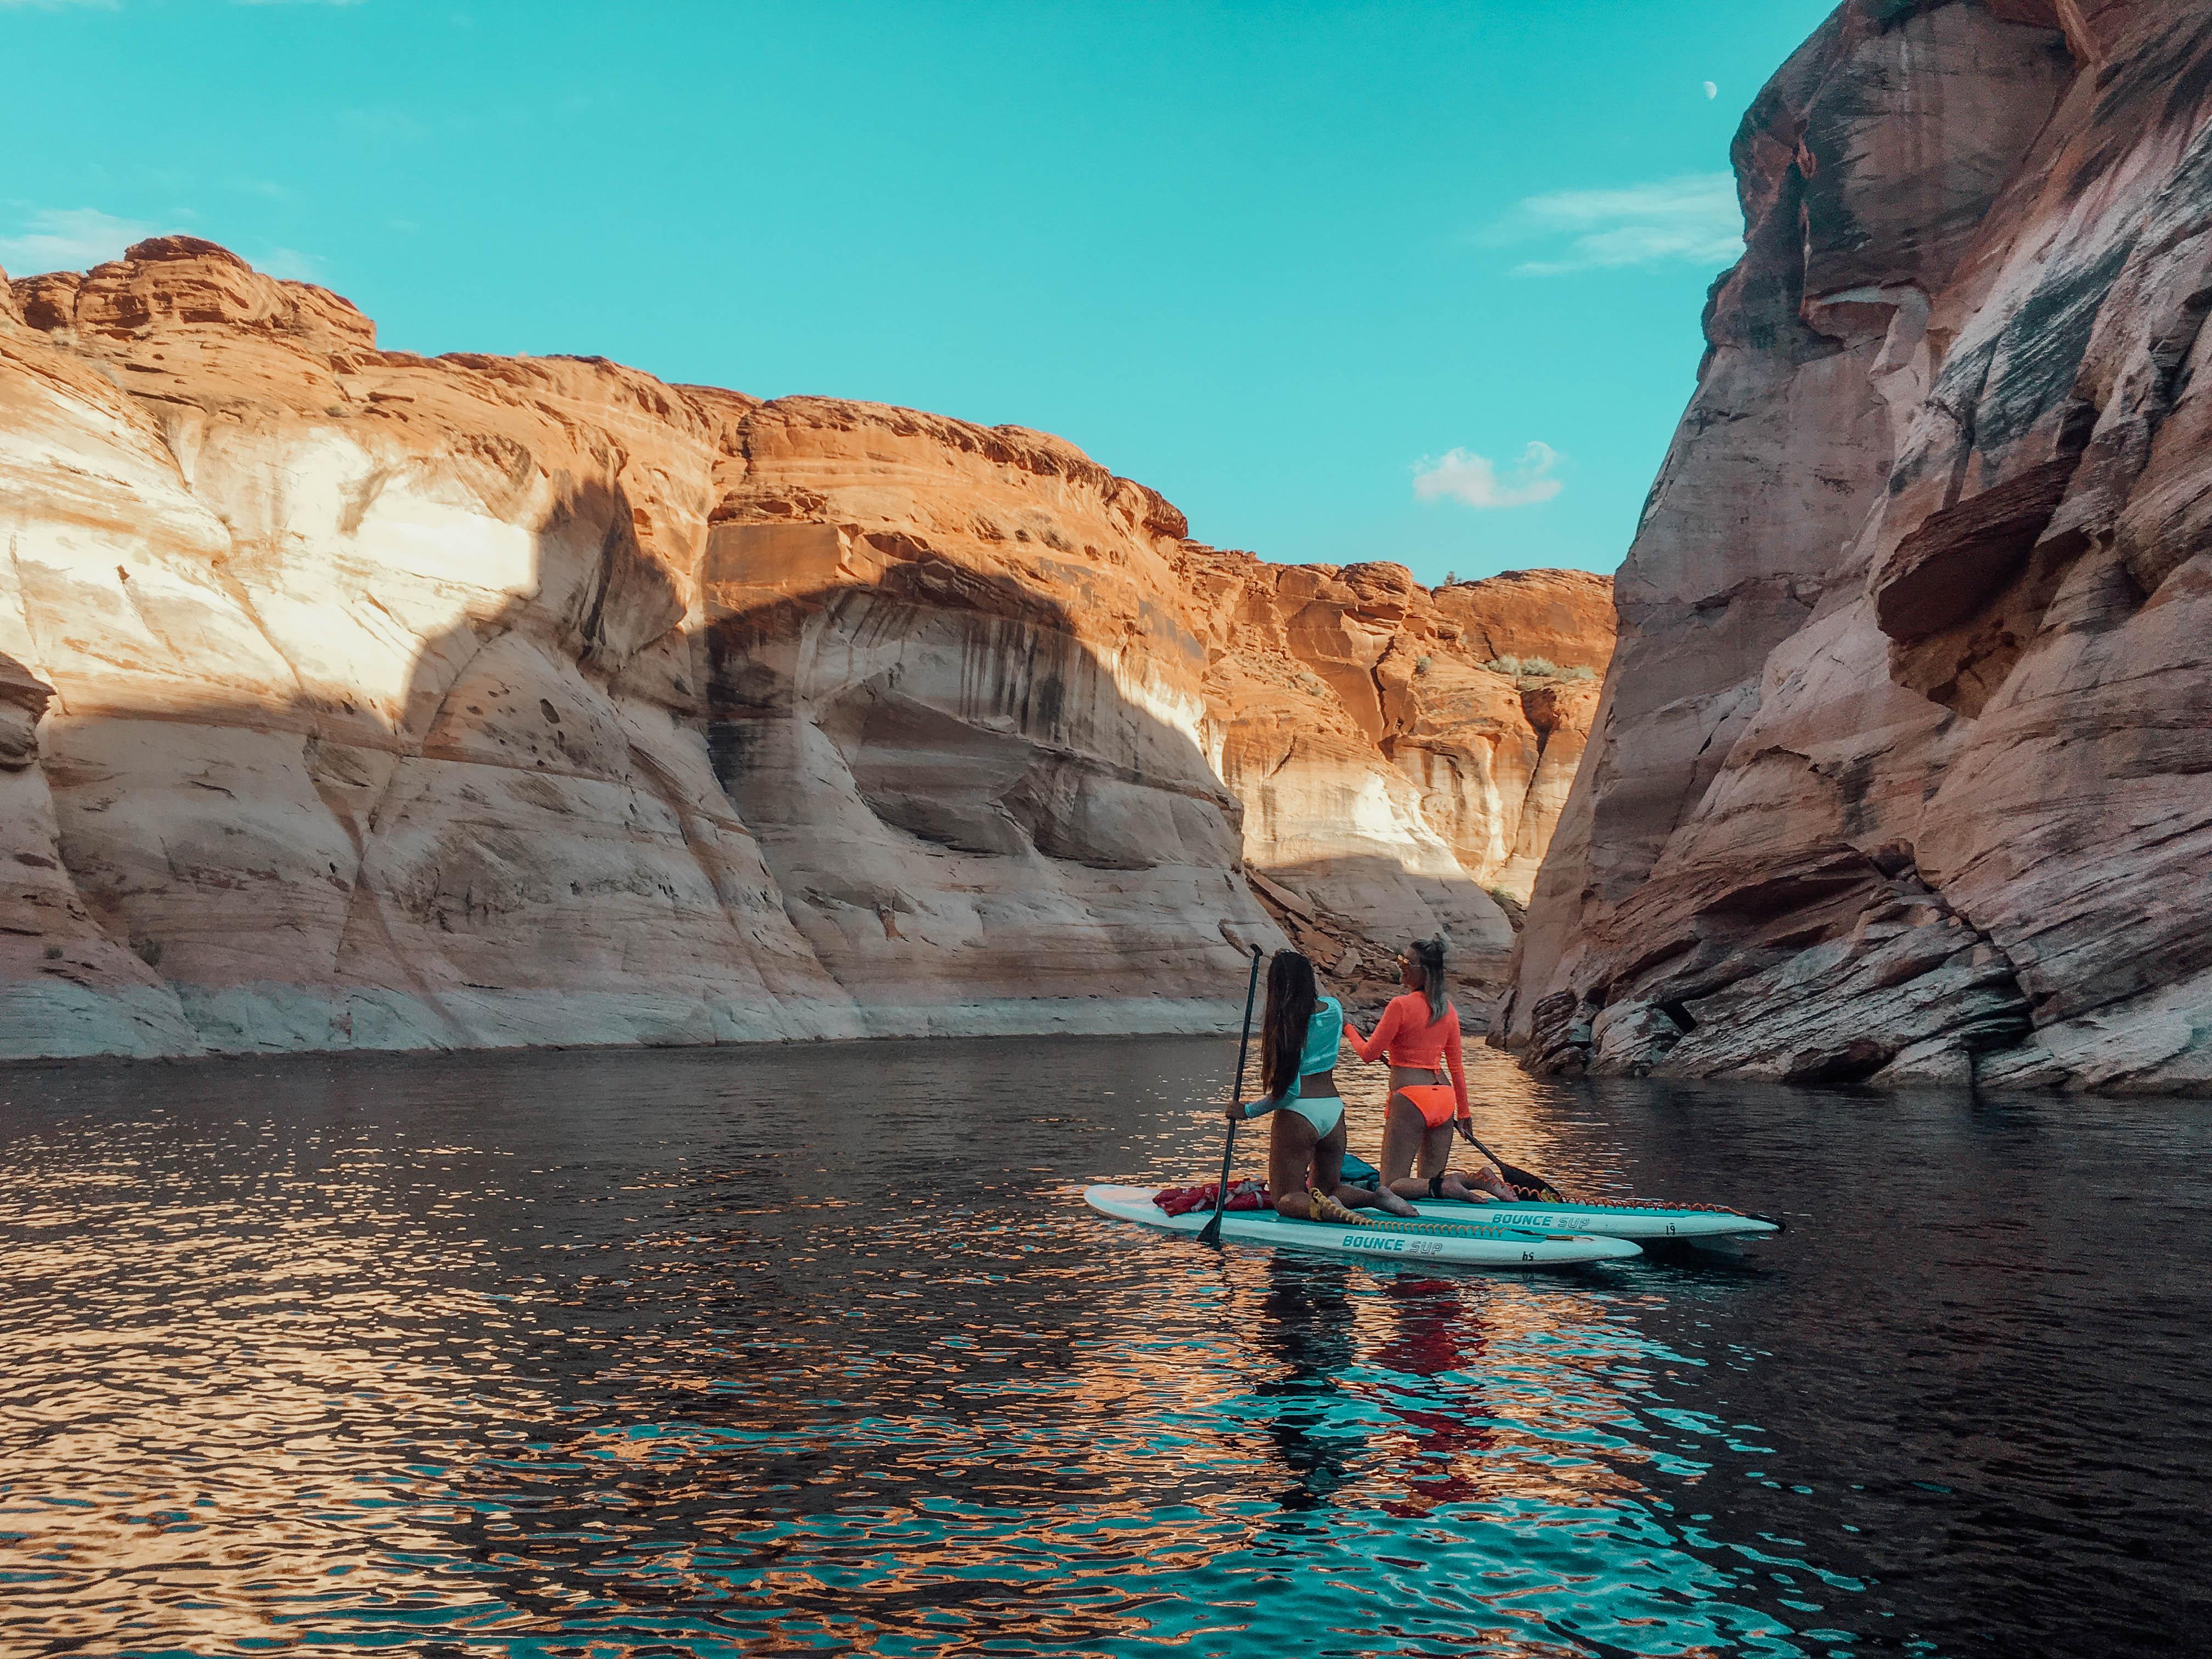 Paddleboarding on Lake Powell